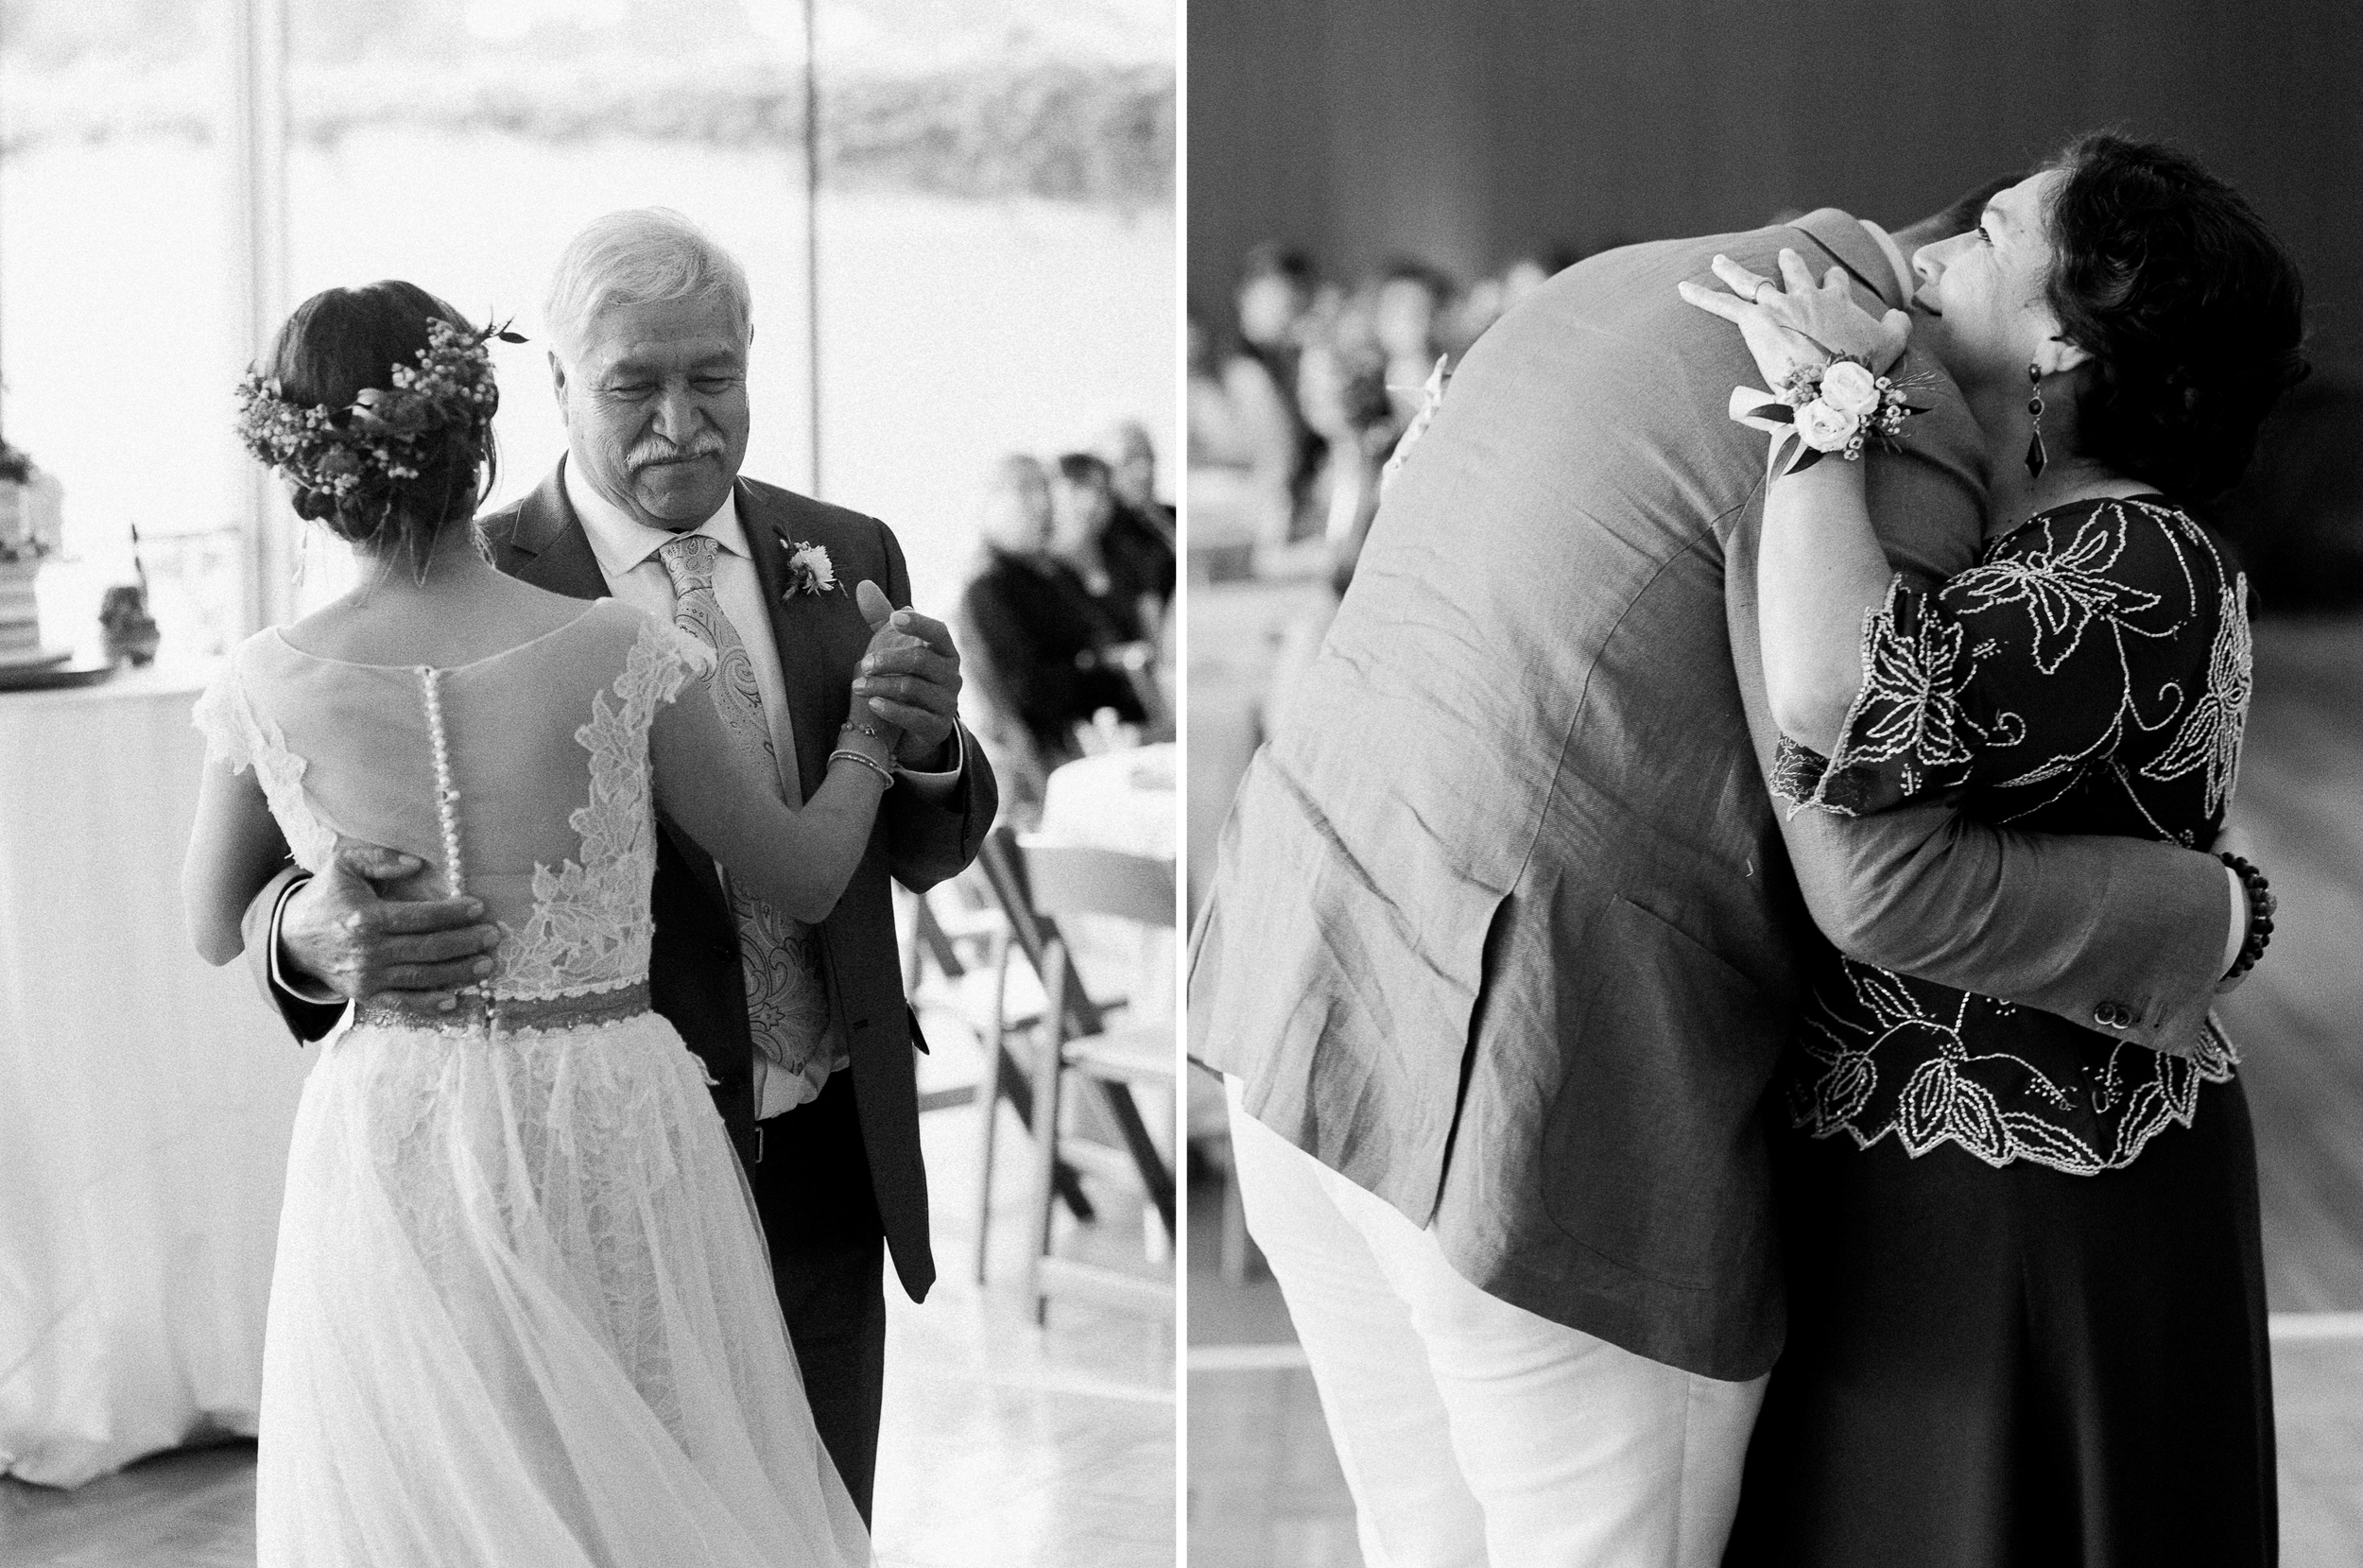 Dana-Fernandez-Photography-Martha-Stewart-Weddings-Houston-Texas-Wedding-Photographer-Film-140.jpg